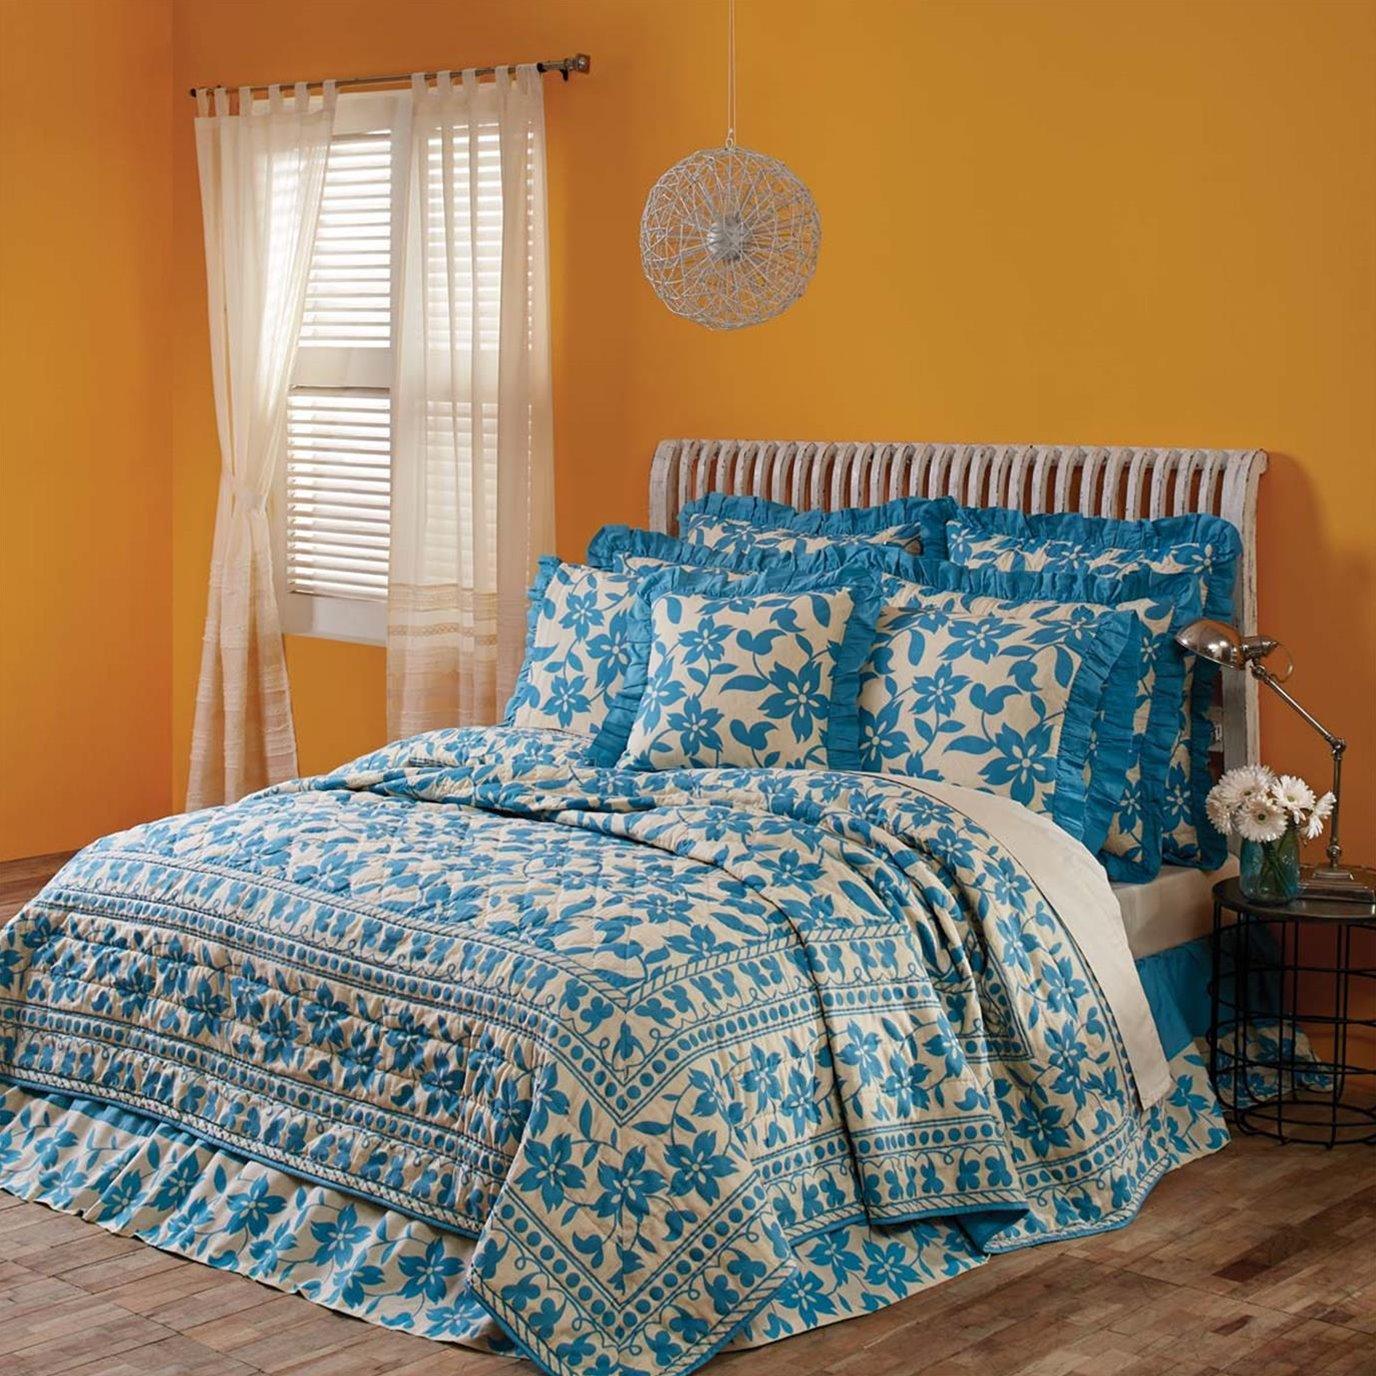 Briar Azure King Quilt 105Wx95L